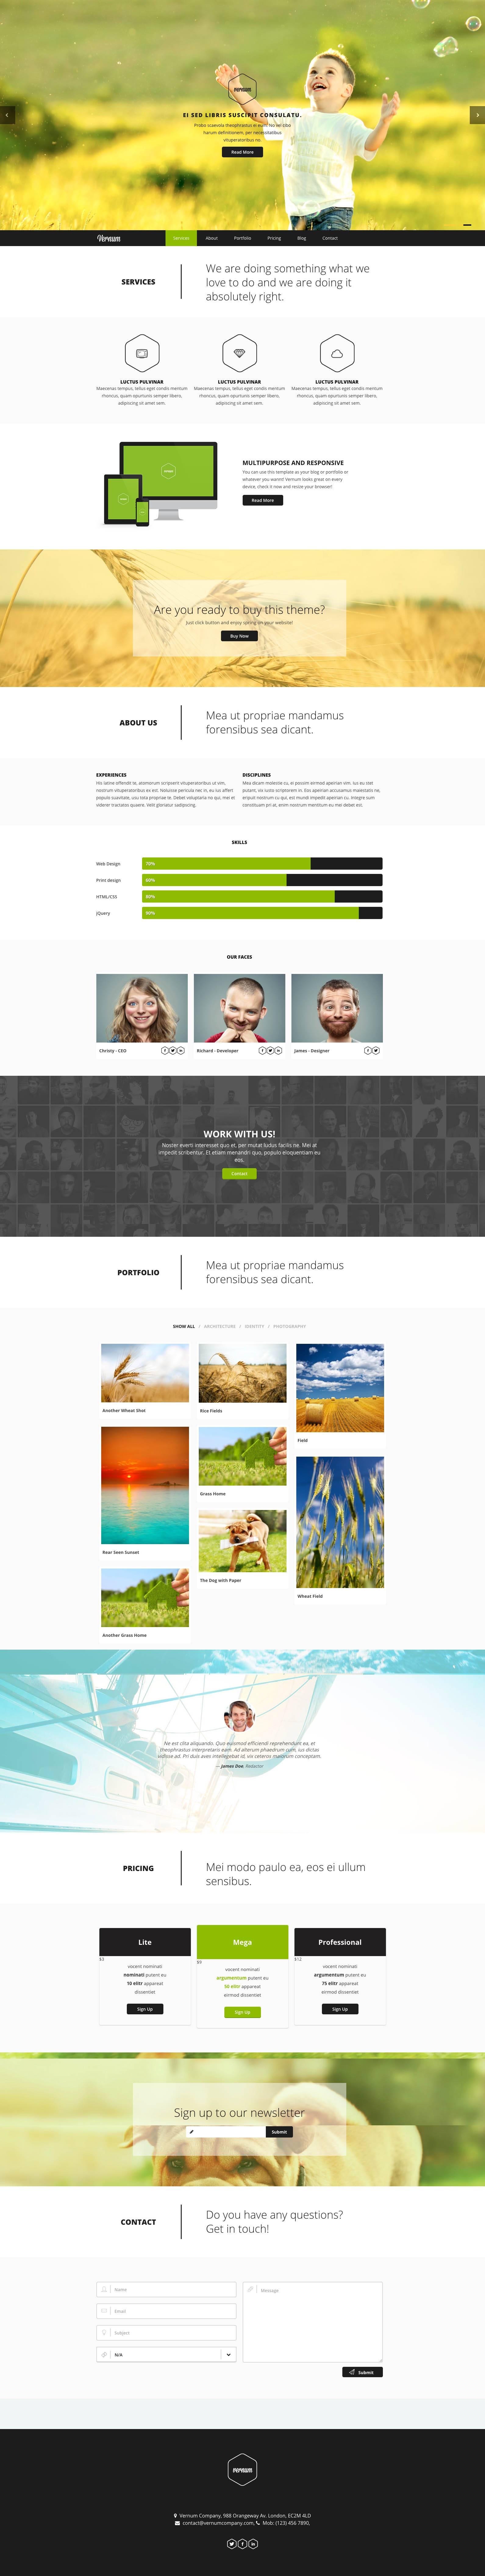 Parallax Wordpress Theme Nulled